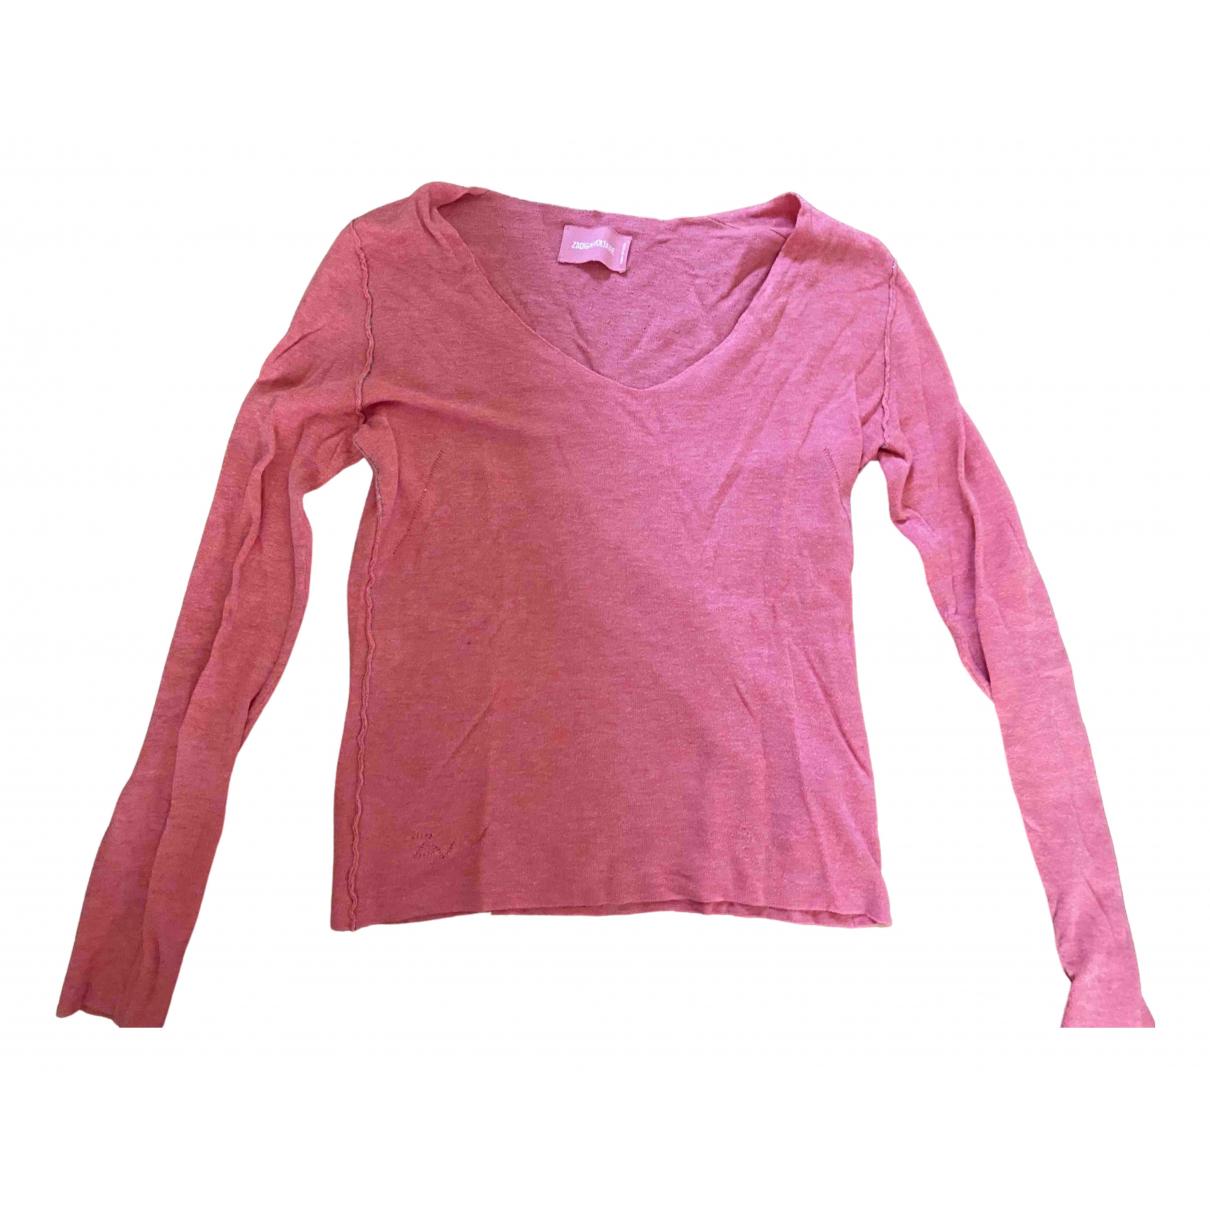 Zadig & Voltaire \N Pink Cotton Knitwear for Women S International